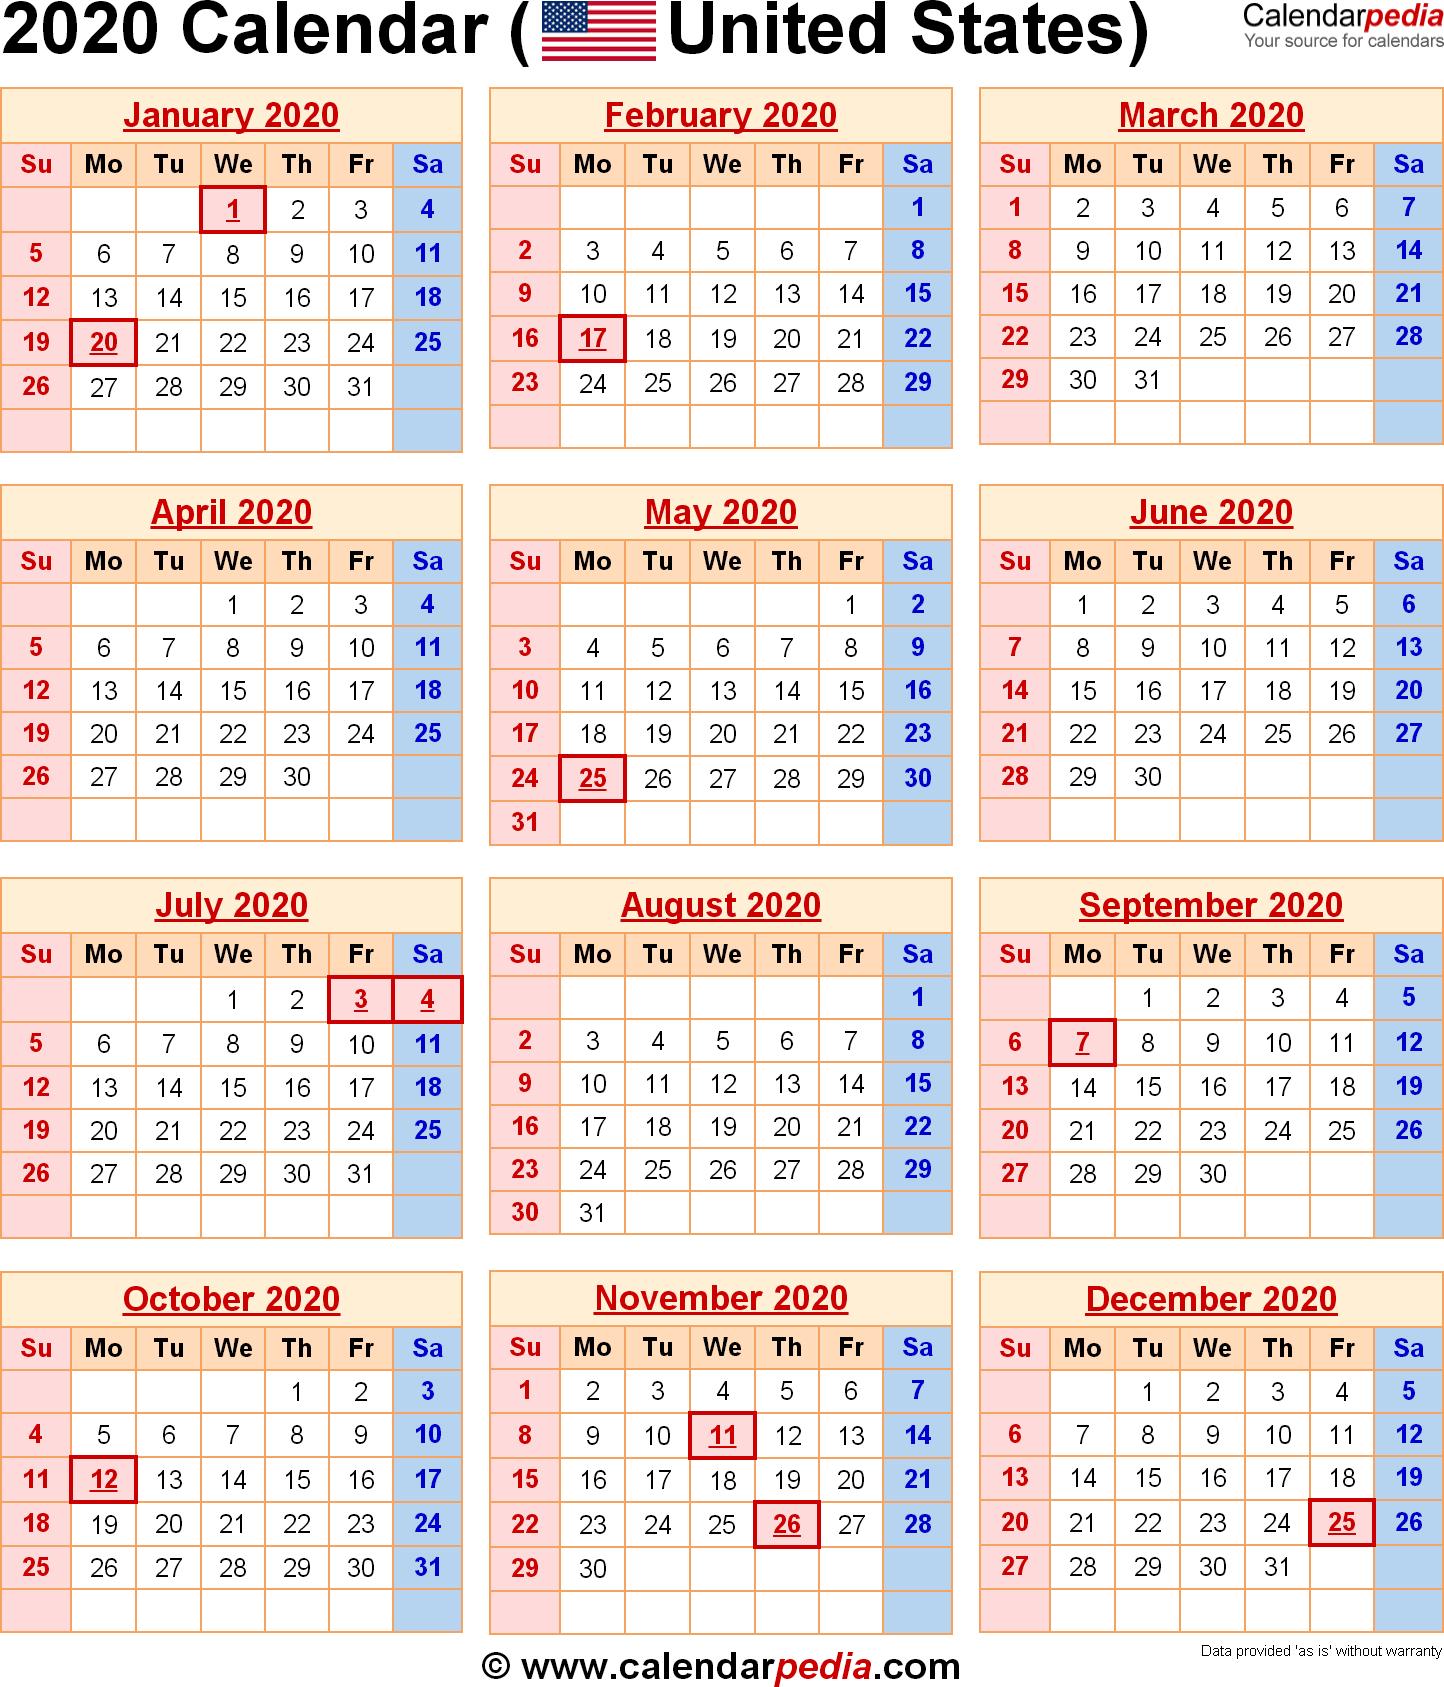 Calendar 2020 Printable With Holidays - Wpa.wpart.co in 2020 Yearly Calendar With Holidays